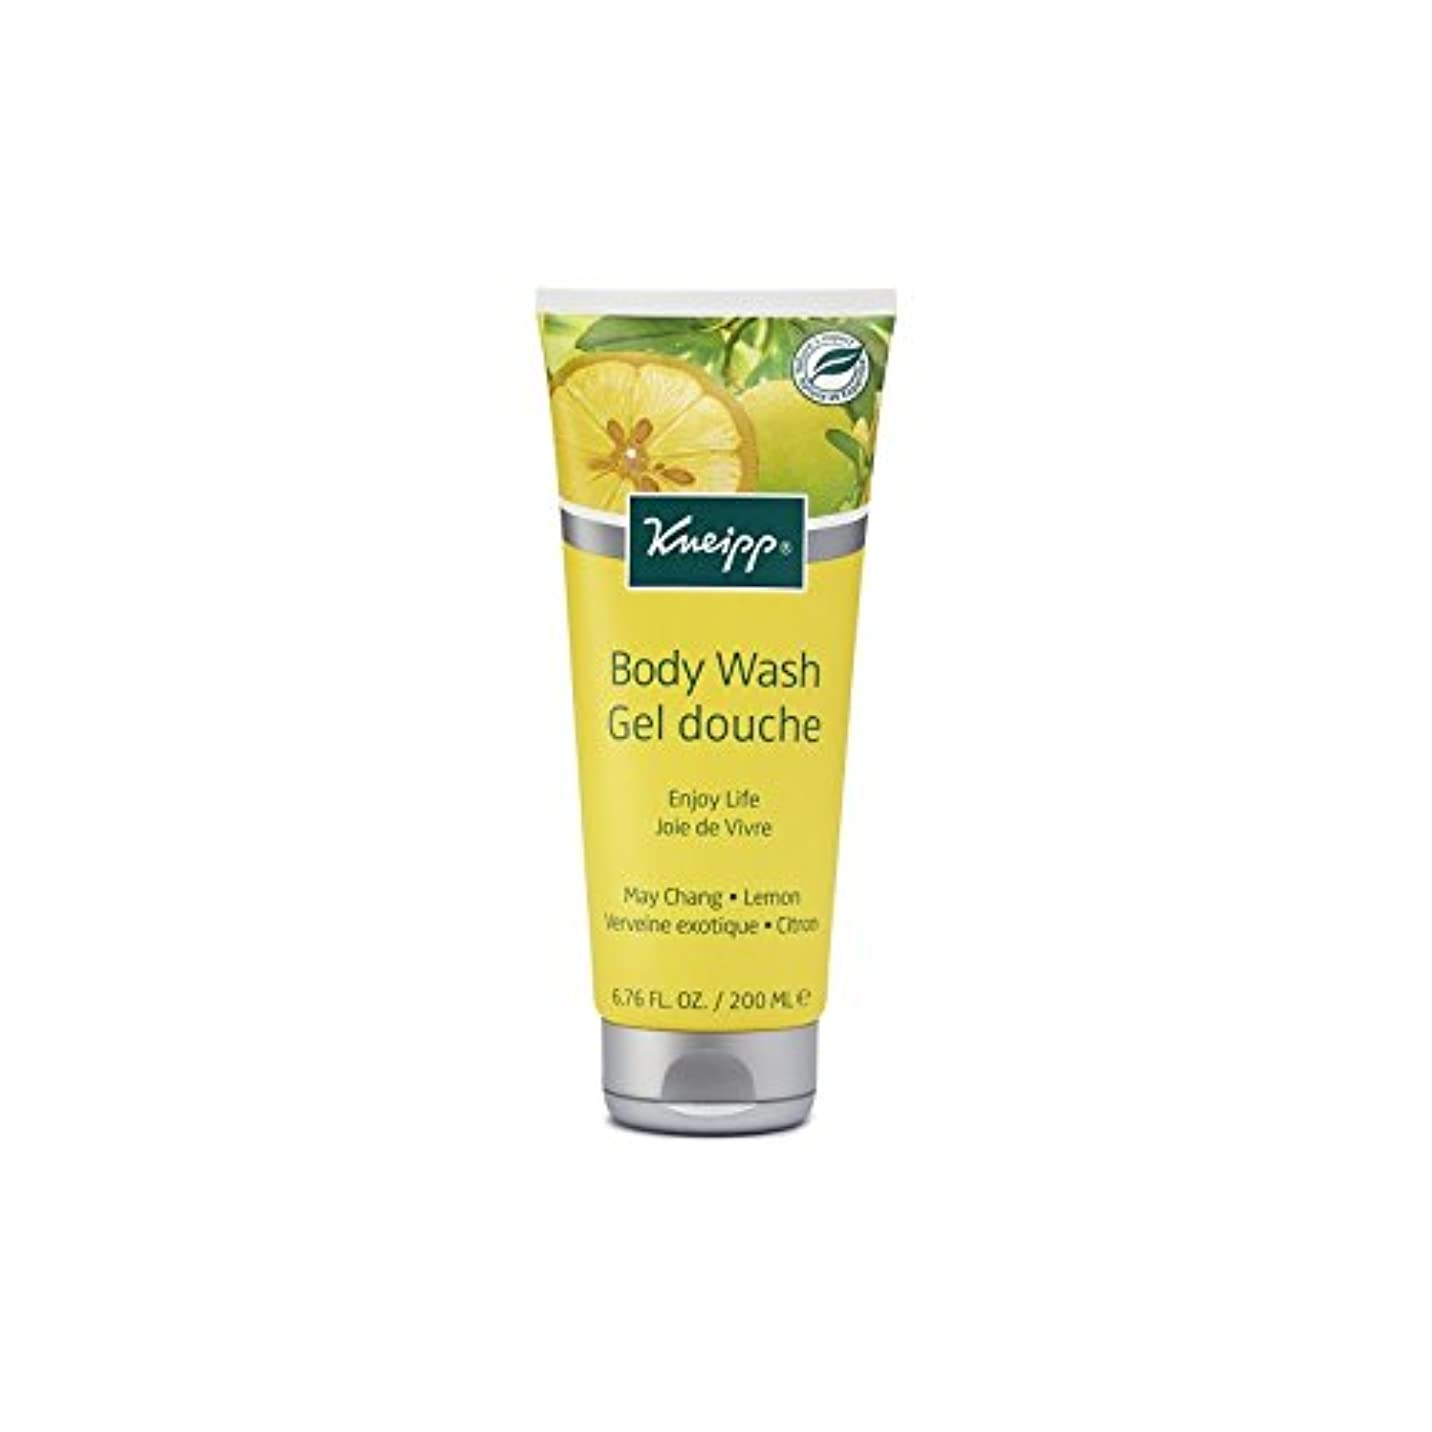 Kneipp Enjoy Life Body Wash (200ml) (Pack of 6) - クナイプは、生命のボディウォッシュ(200ミリリットル)を楽しみます x6 [並行輸入品]